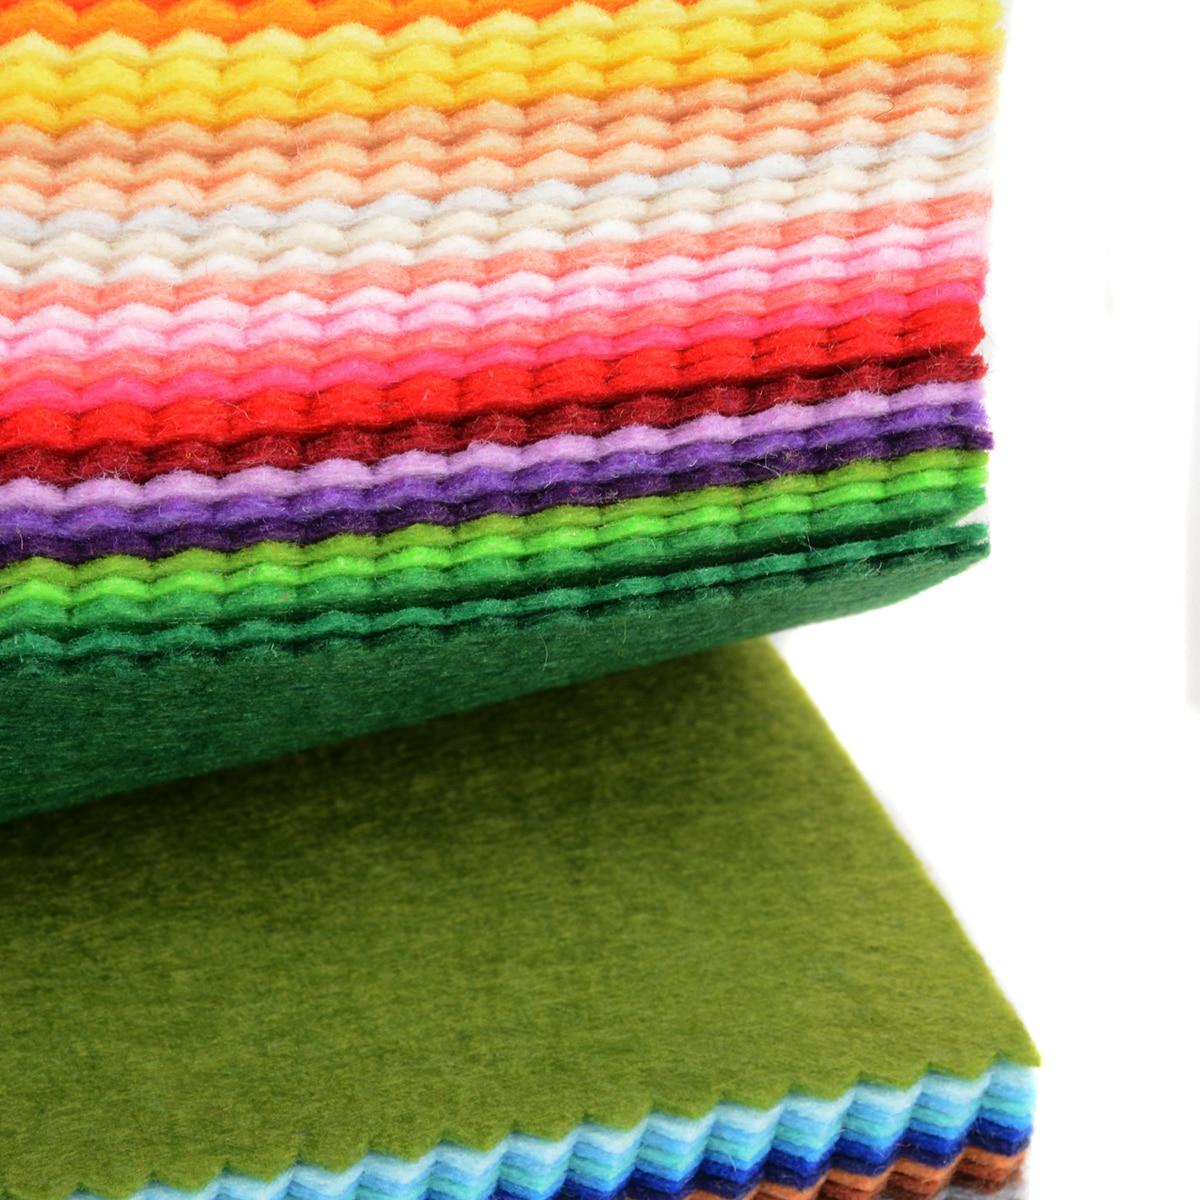 41pcs 41 Colores Fieltro Hojas Lana Poliester Mezcla Tela Kit